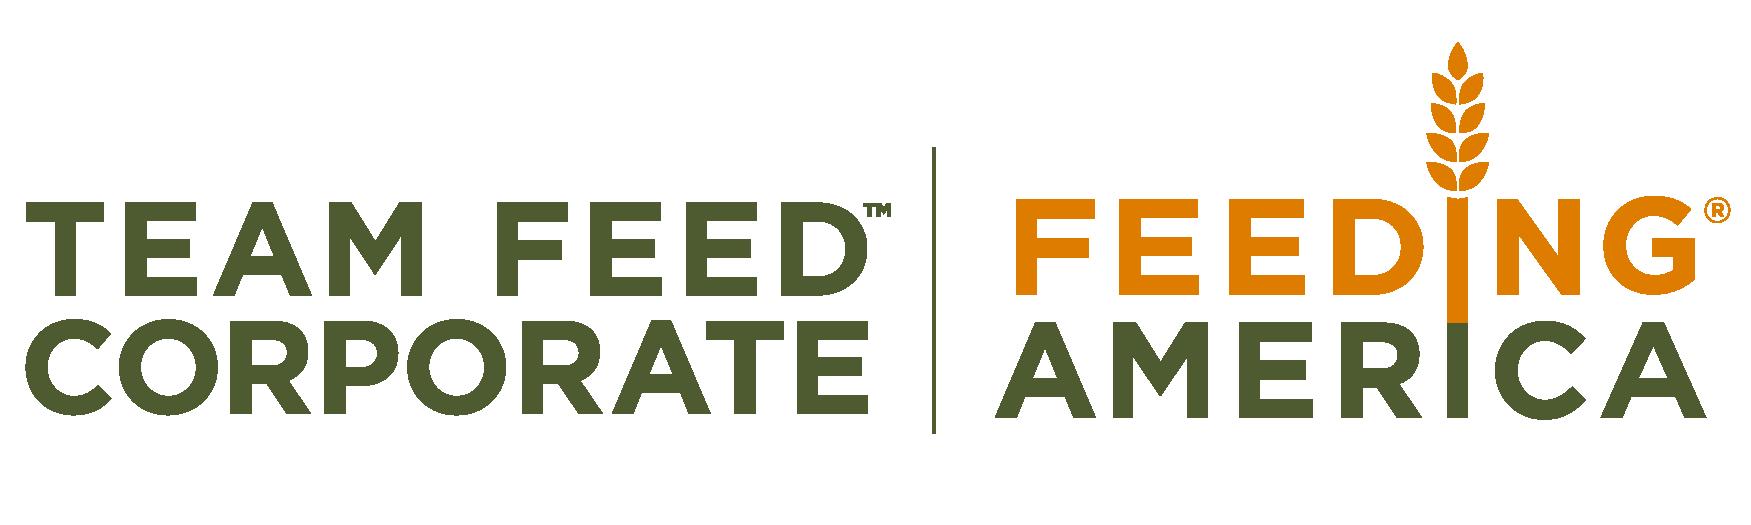 Team Feed Corporate | Feeding America